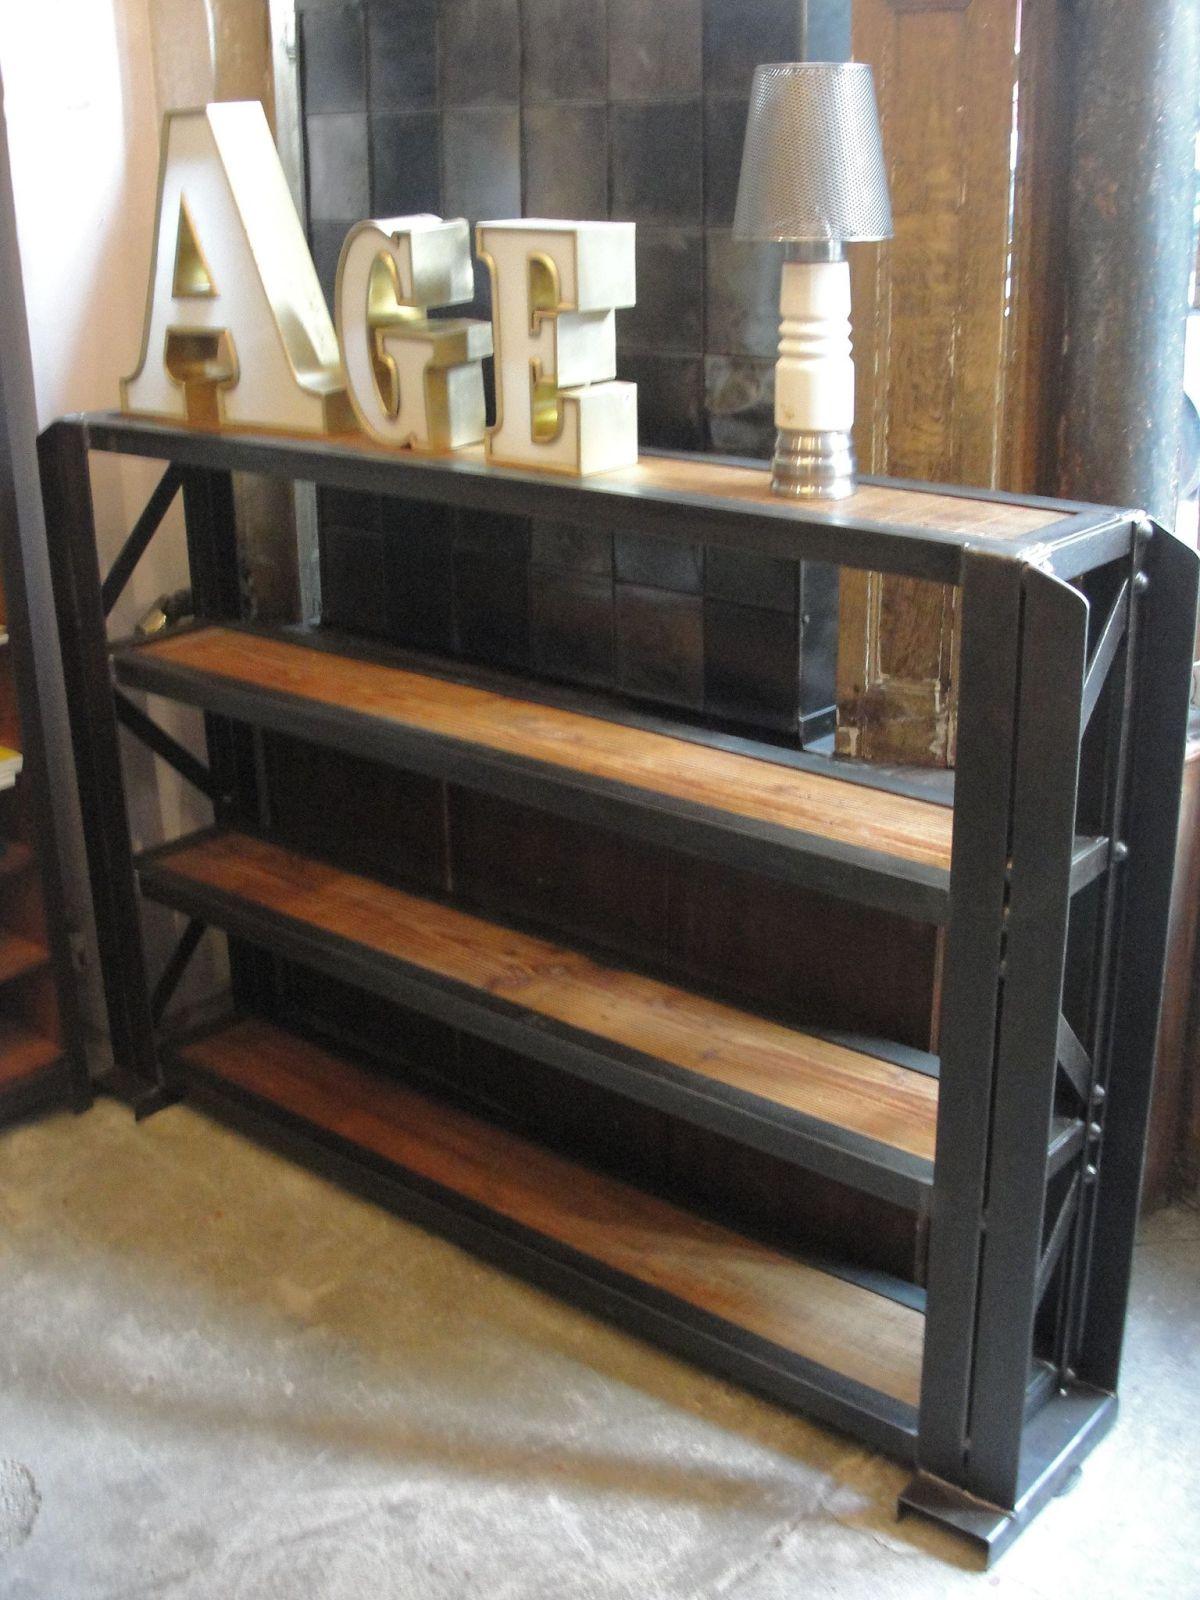 biblioth que industrielle 1 carouche interpr te d 39 objets. Black Bedroom Furniture Sets. Home Design Ideas